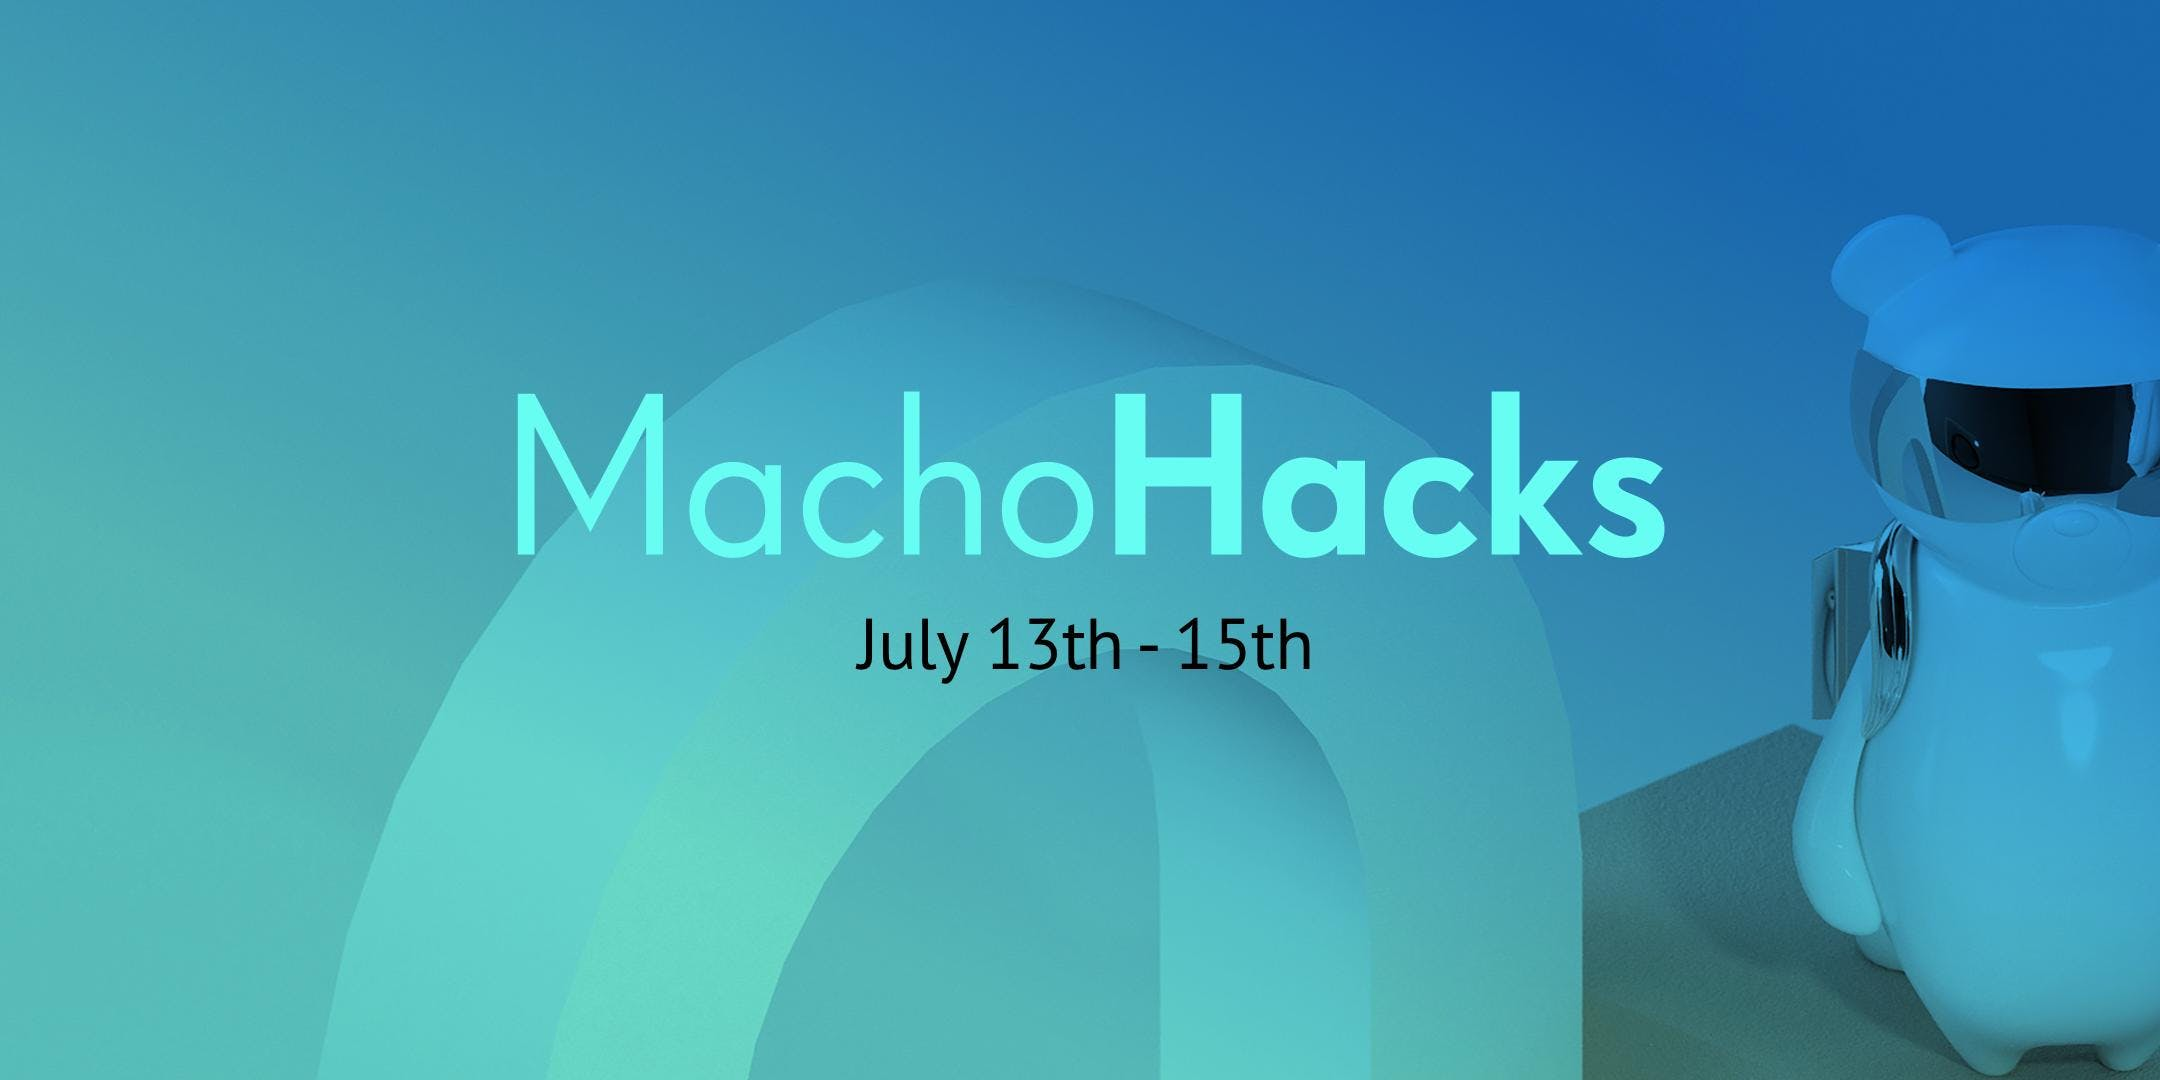 MachoHacks - July 13th - 15th 2018 - 48 hours - www.machohacks.com